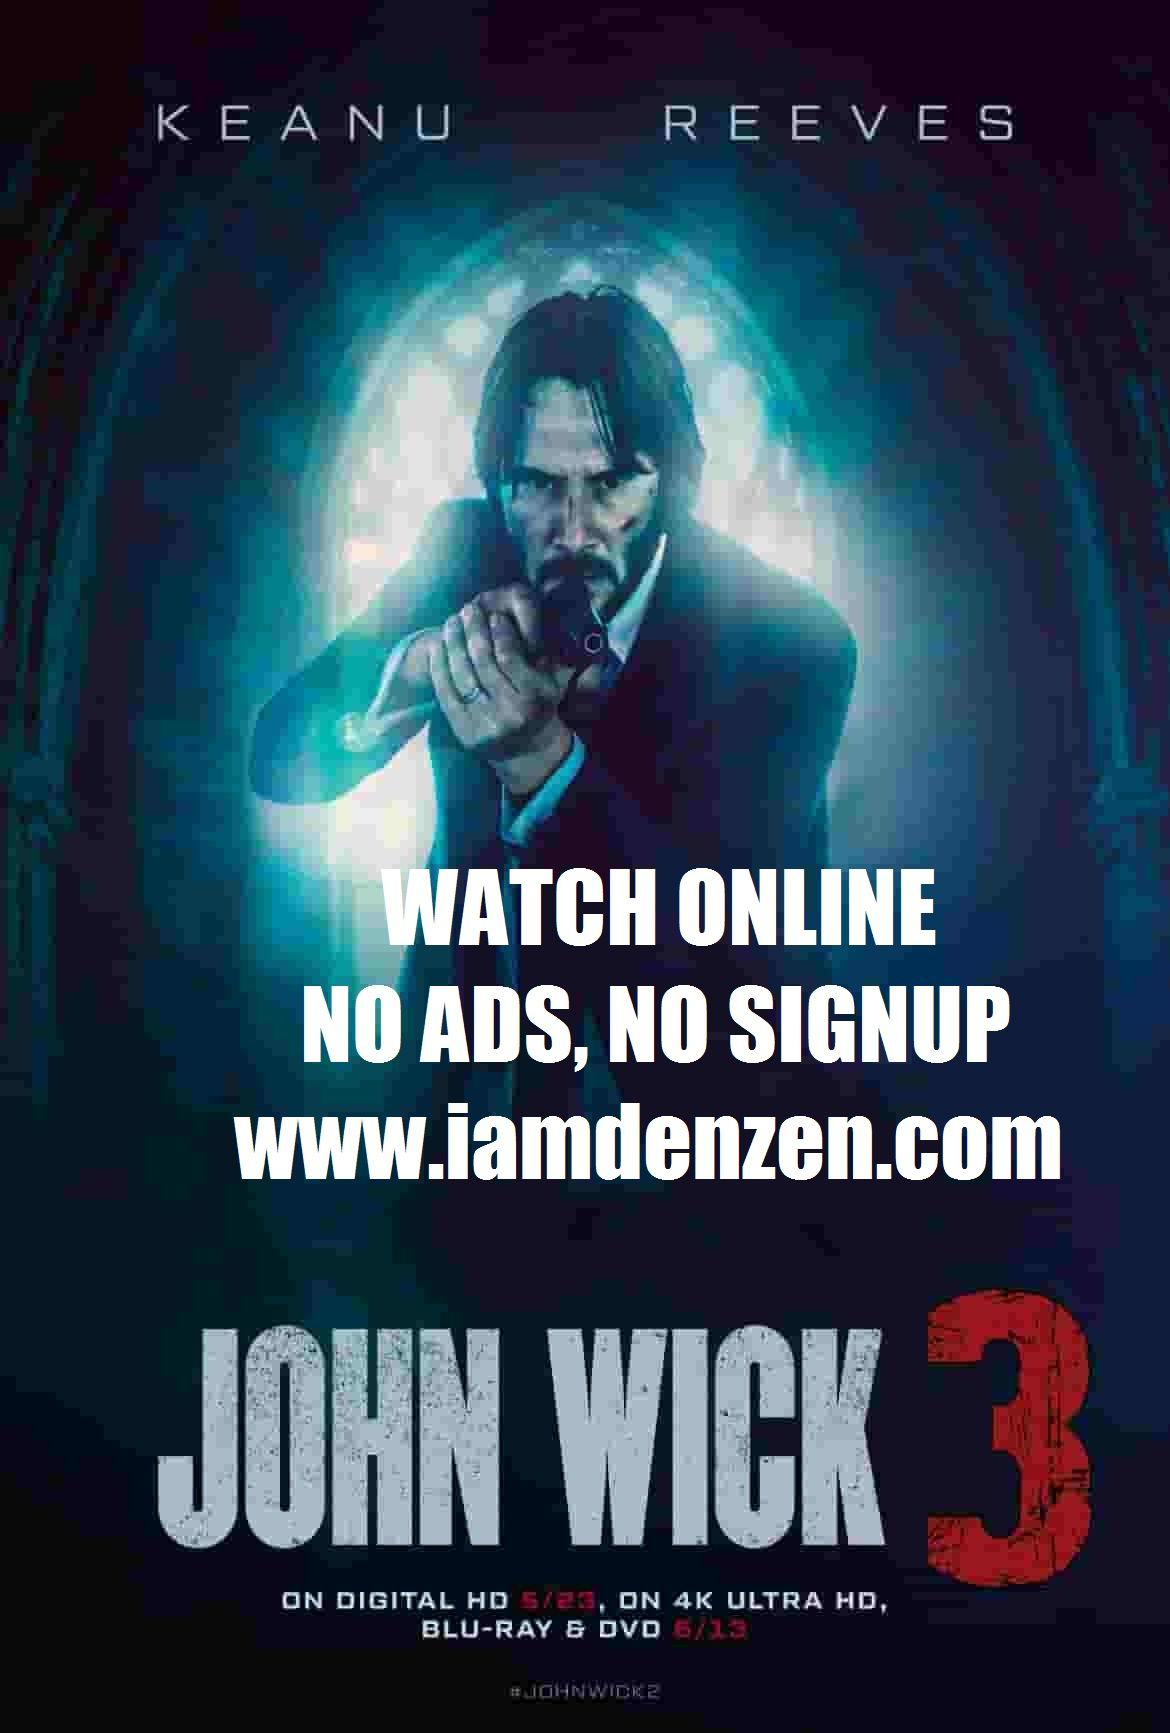 watch john wick online free no sign up